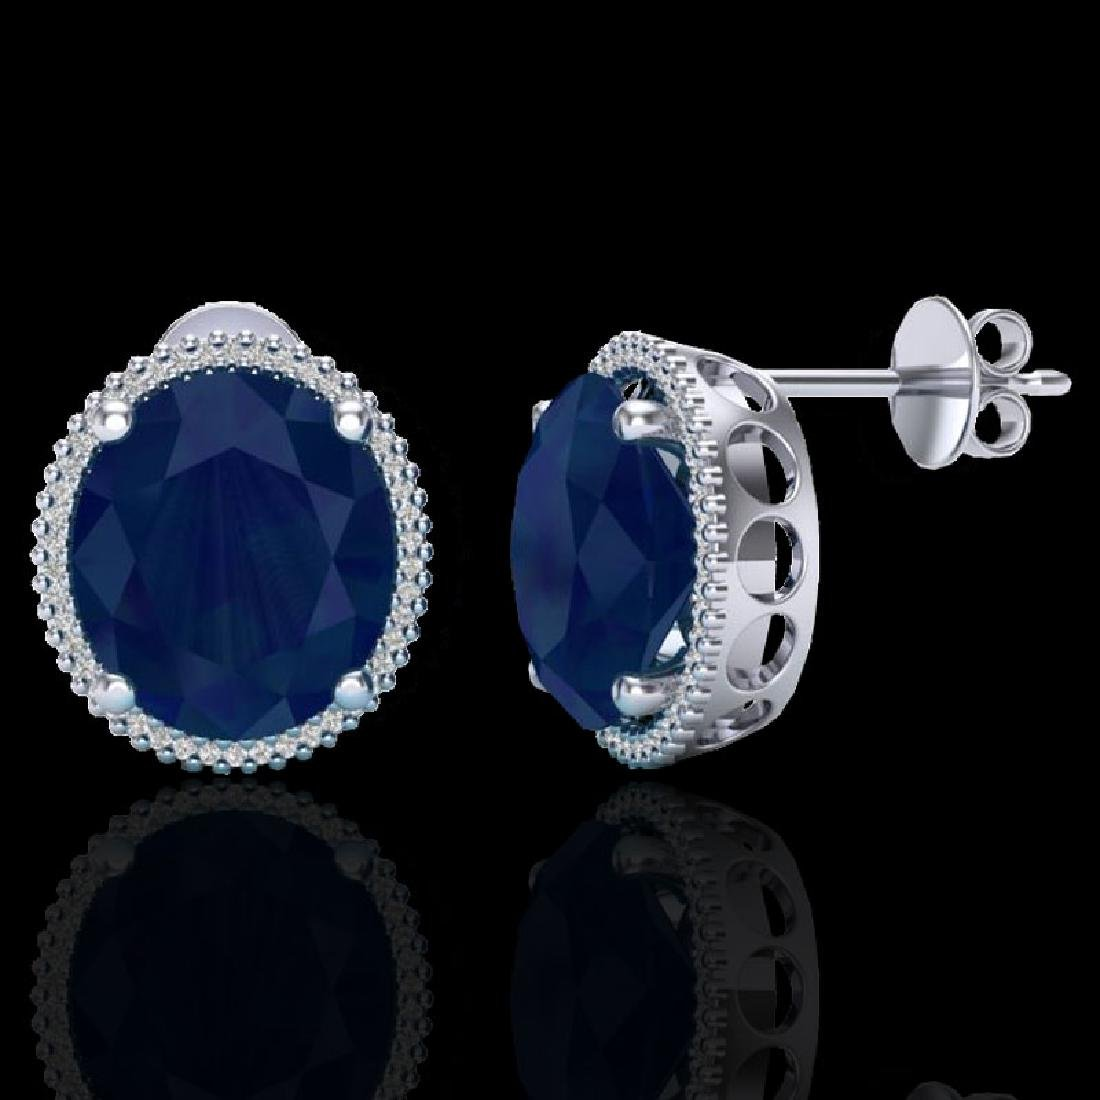 25 CTW Sapphire & Micro Pave VS/SI Diamond Halo - 2